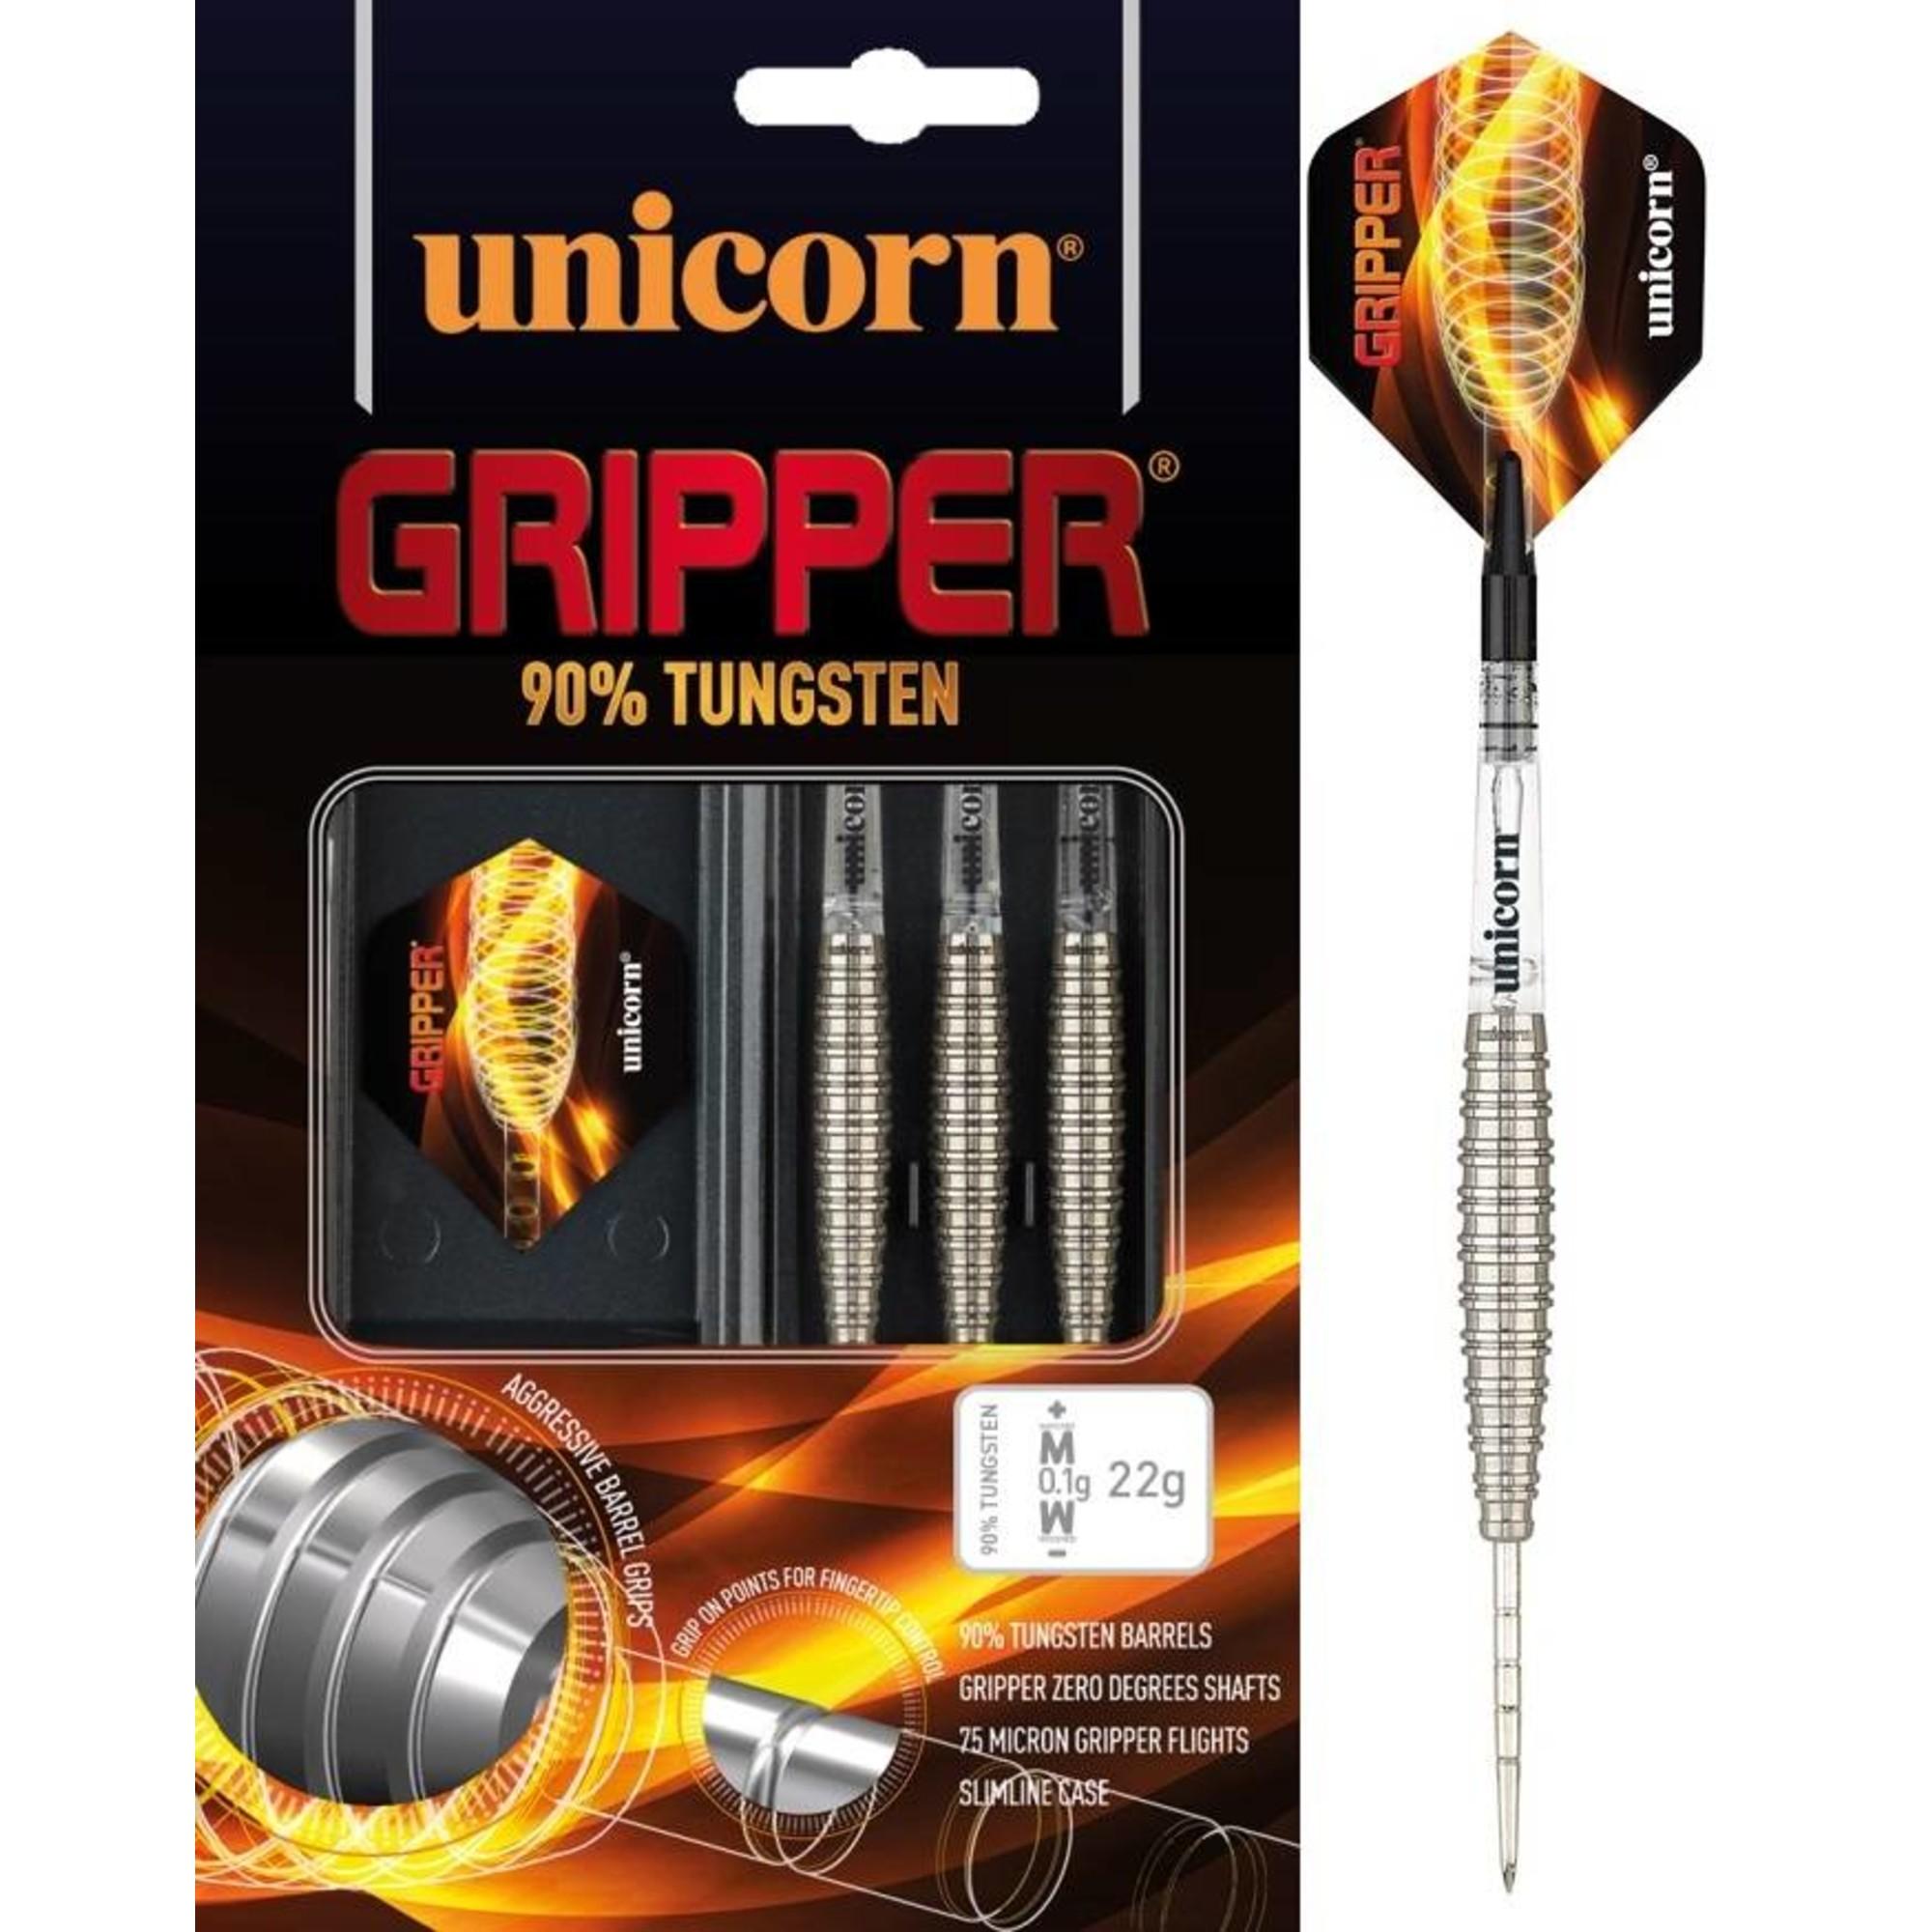 UNICORN GRIPPER 5 90% STEELDART 22g